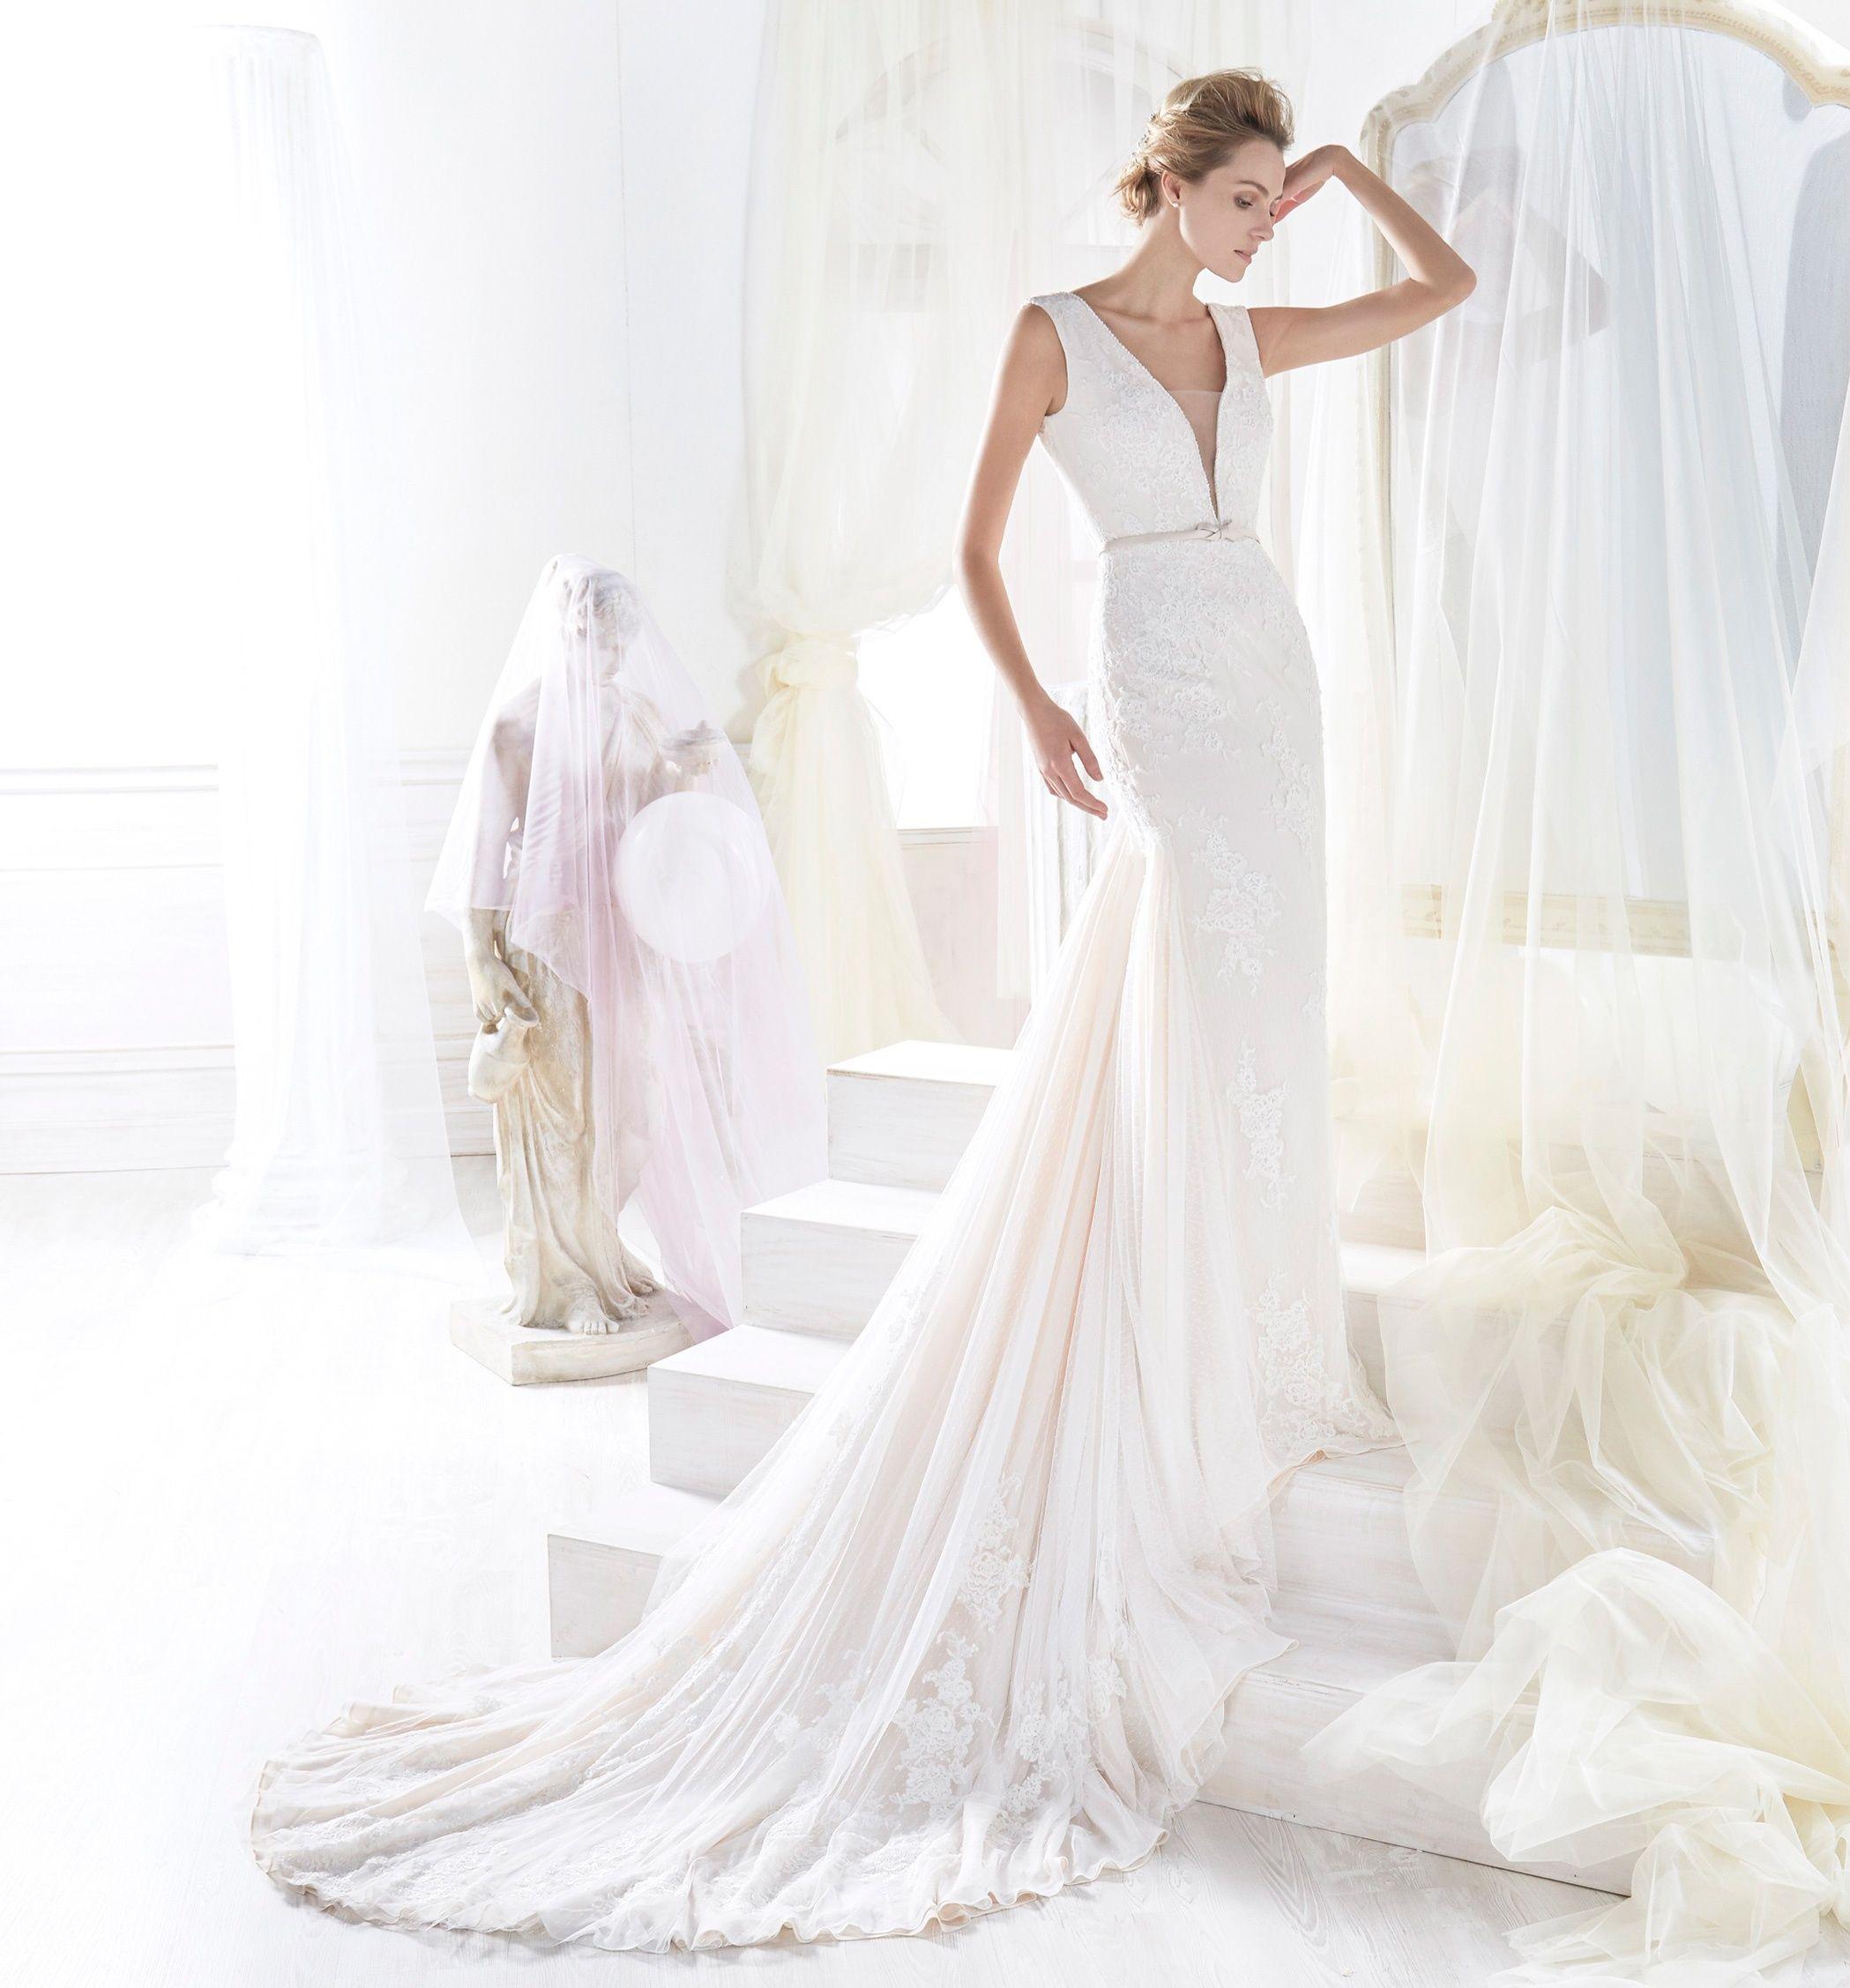 Fashion bride collection nicole niab wedding dress